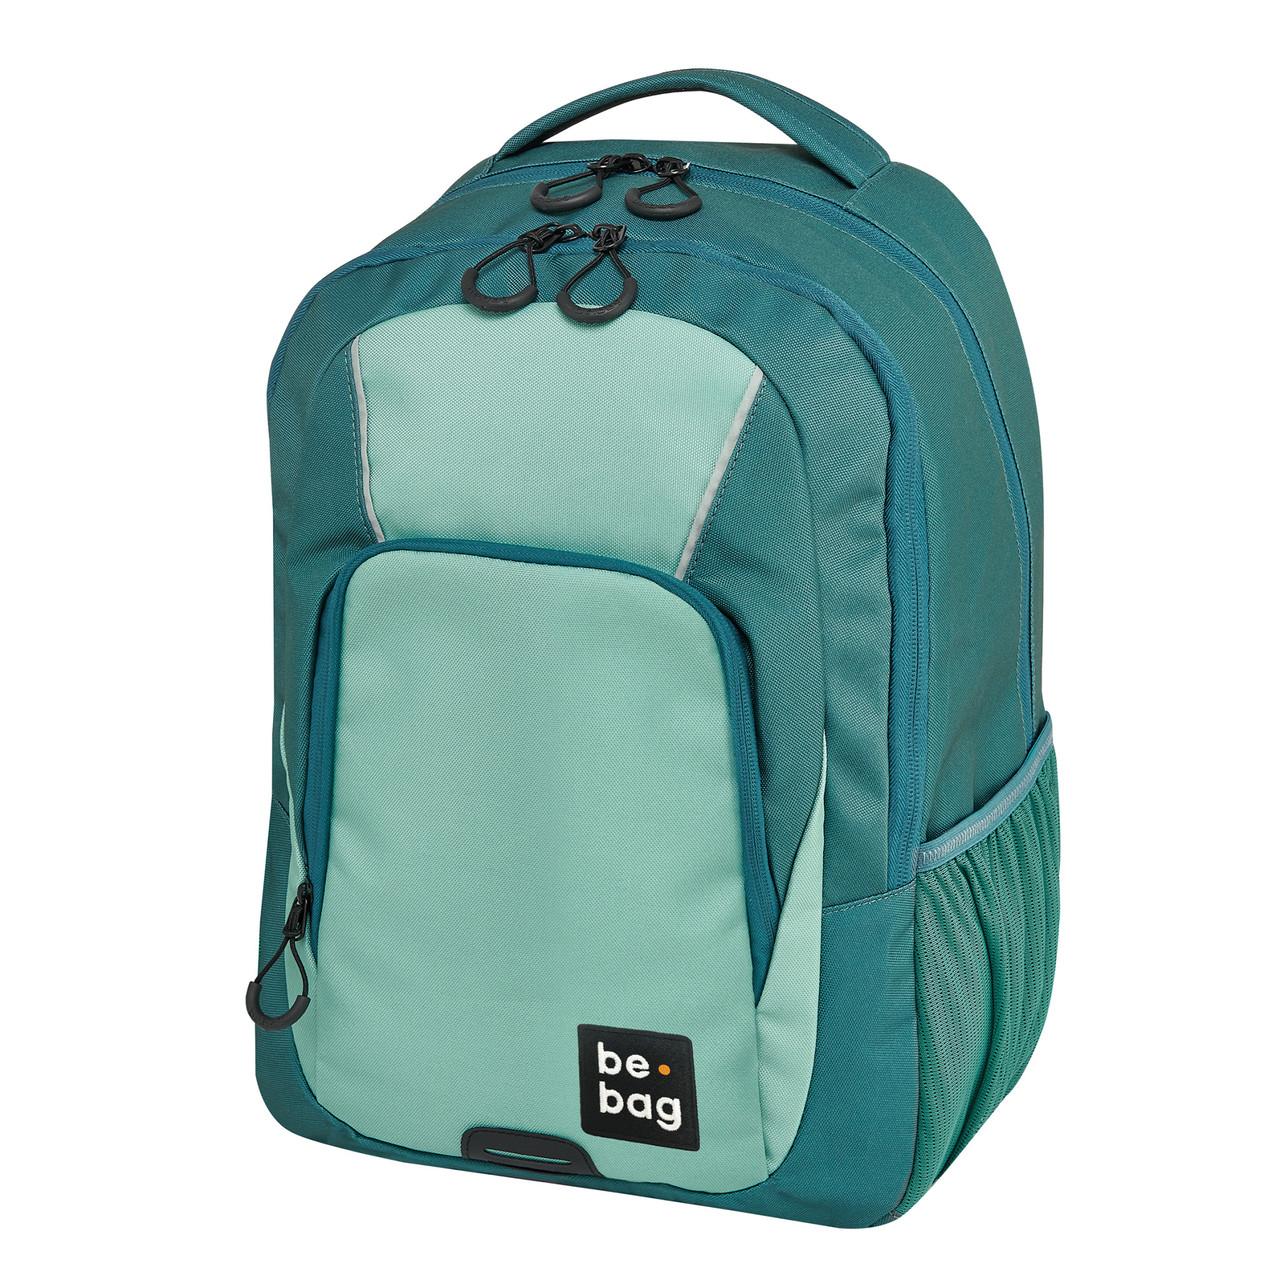 Рюкзак Herlitz Be.Bag be.simple Dark Green бірюзовий